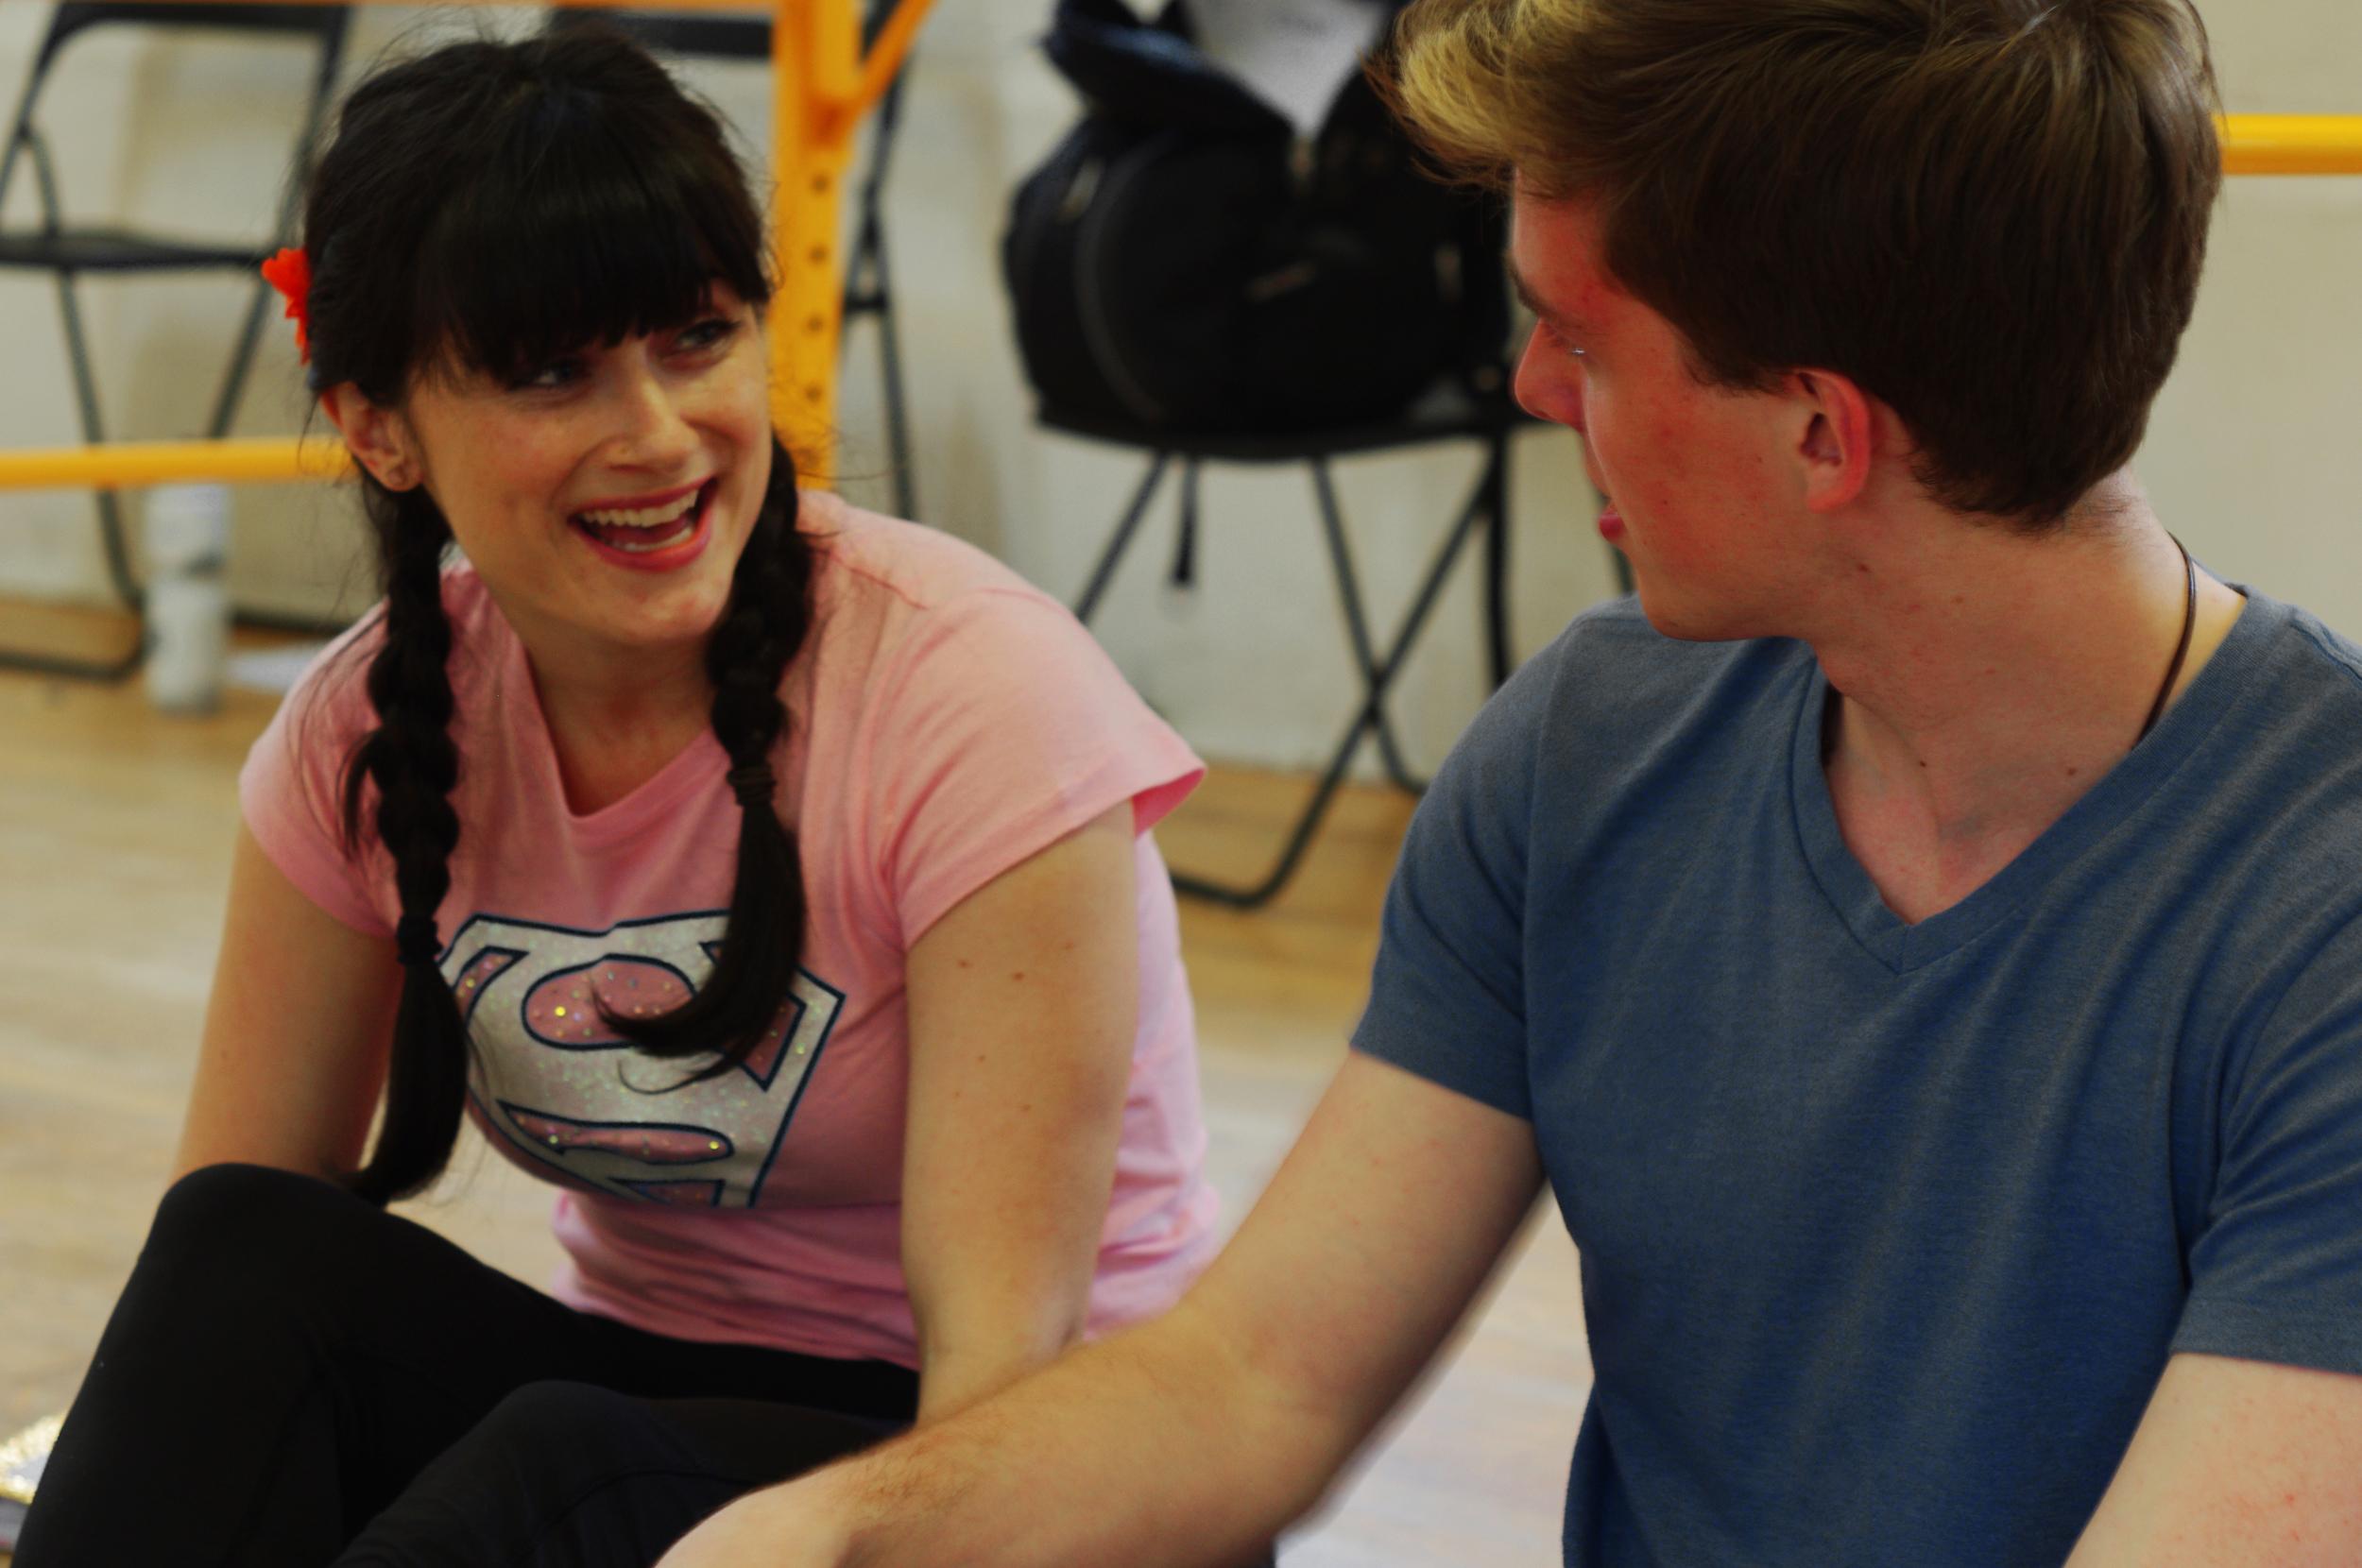 Jessica Dorcey as Laura Lewis and Adam Keller as Mark Kenton